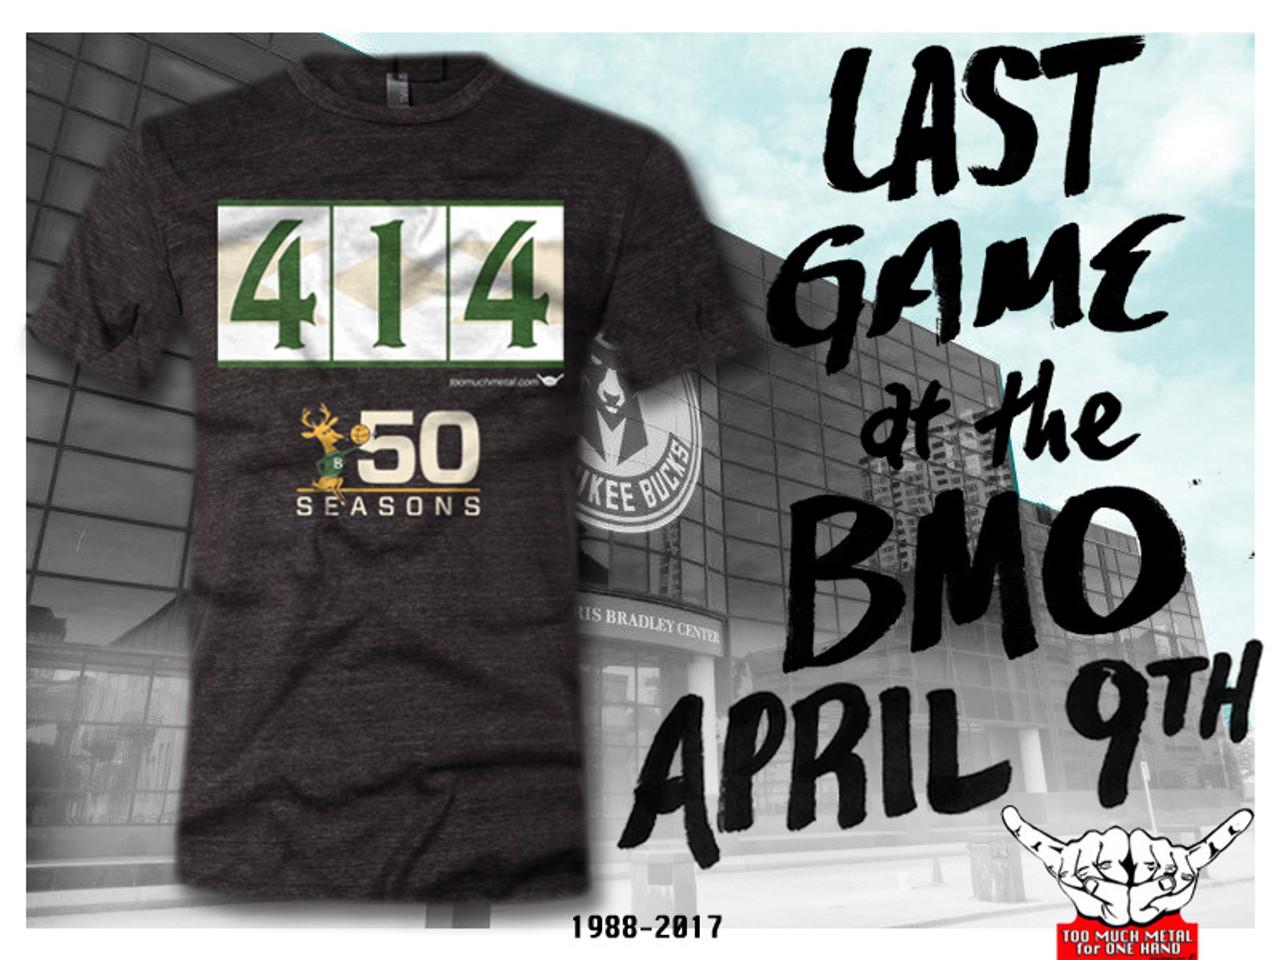 Last regular season Bucks game at Bradley Center